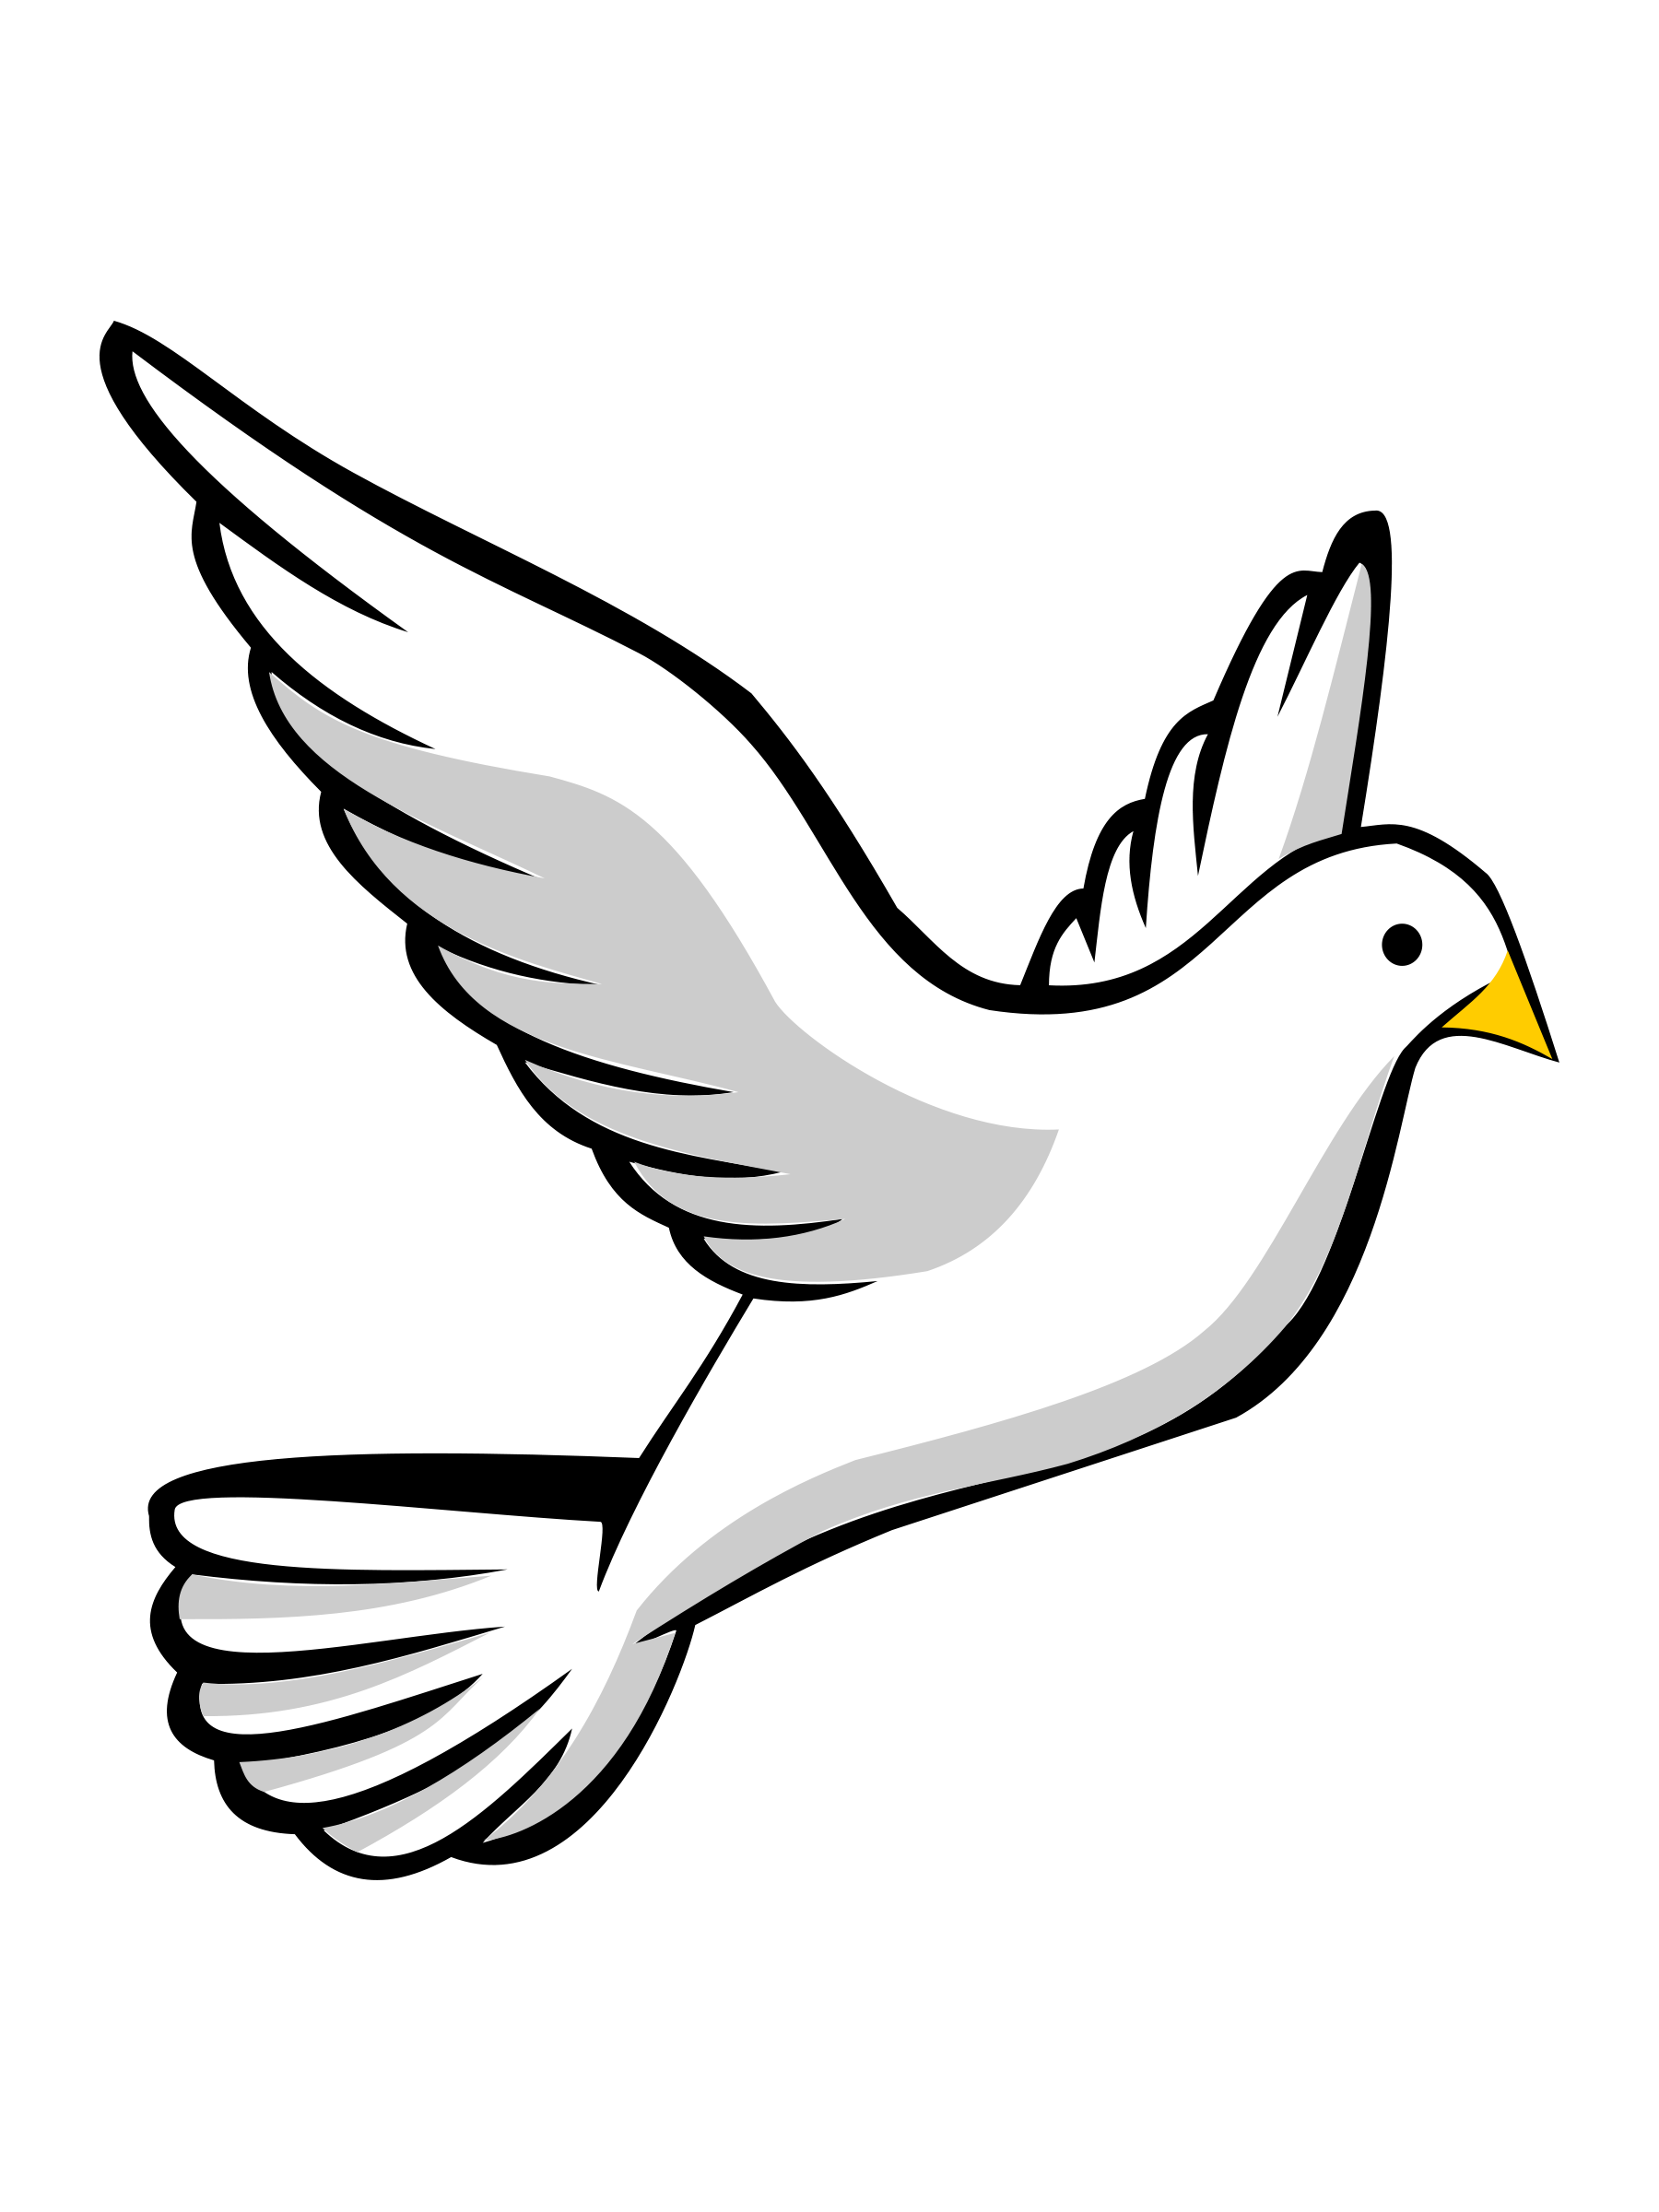 White Dove Clipart | Clipart Panda - Free Clipart Images